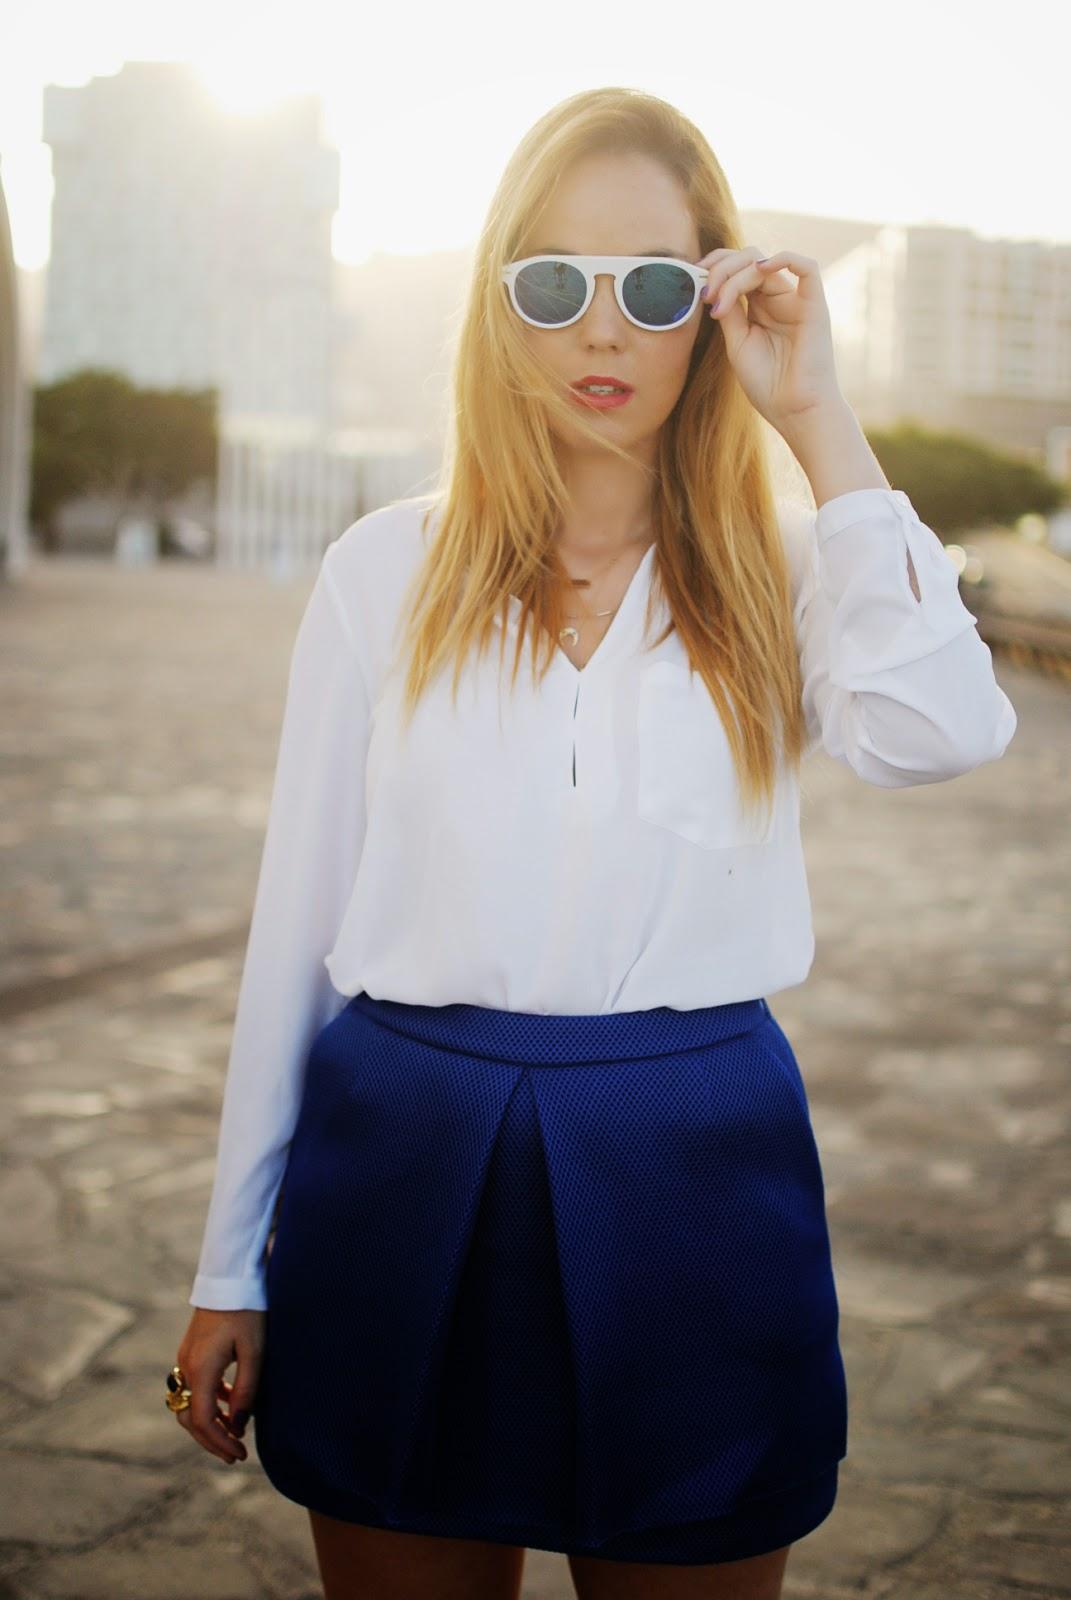 nery hdez, gafas de espejo, azul klein, blonde, wholesales celebshades, front row shop, neoprene skirt